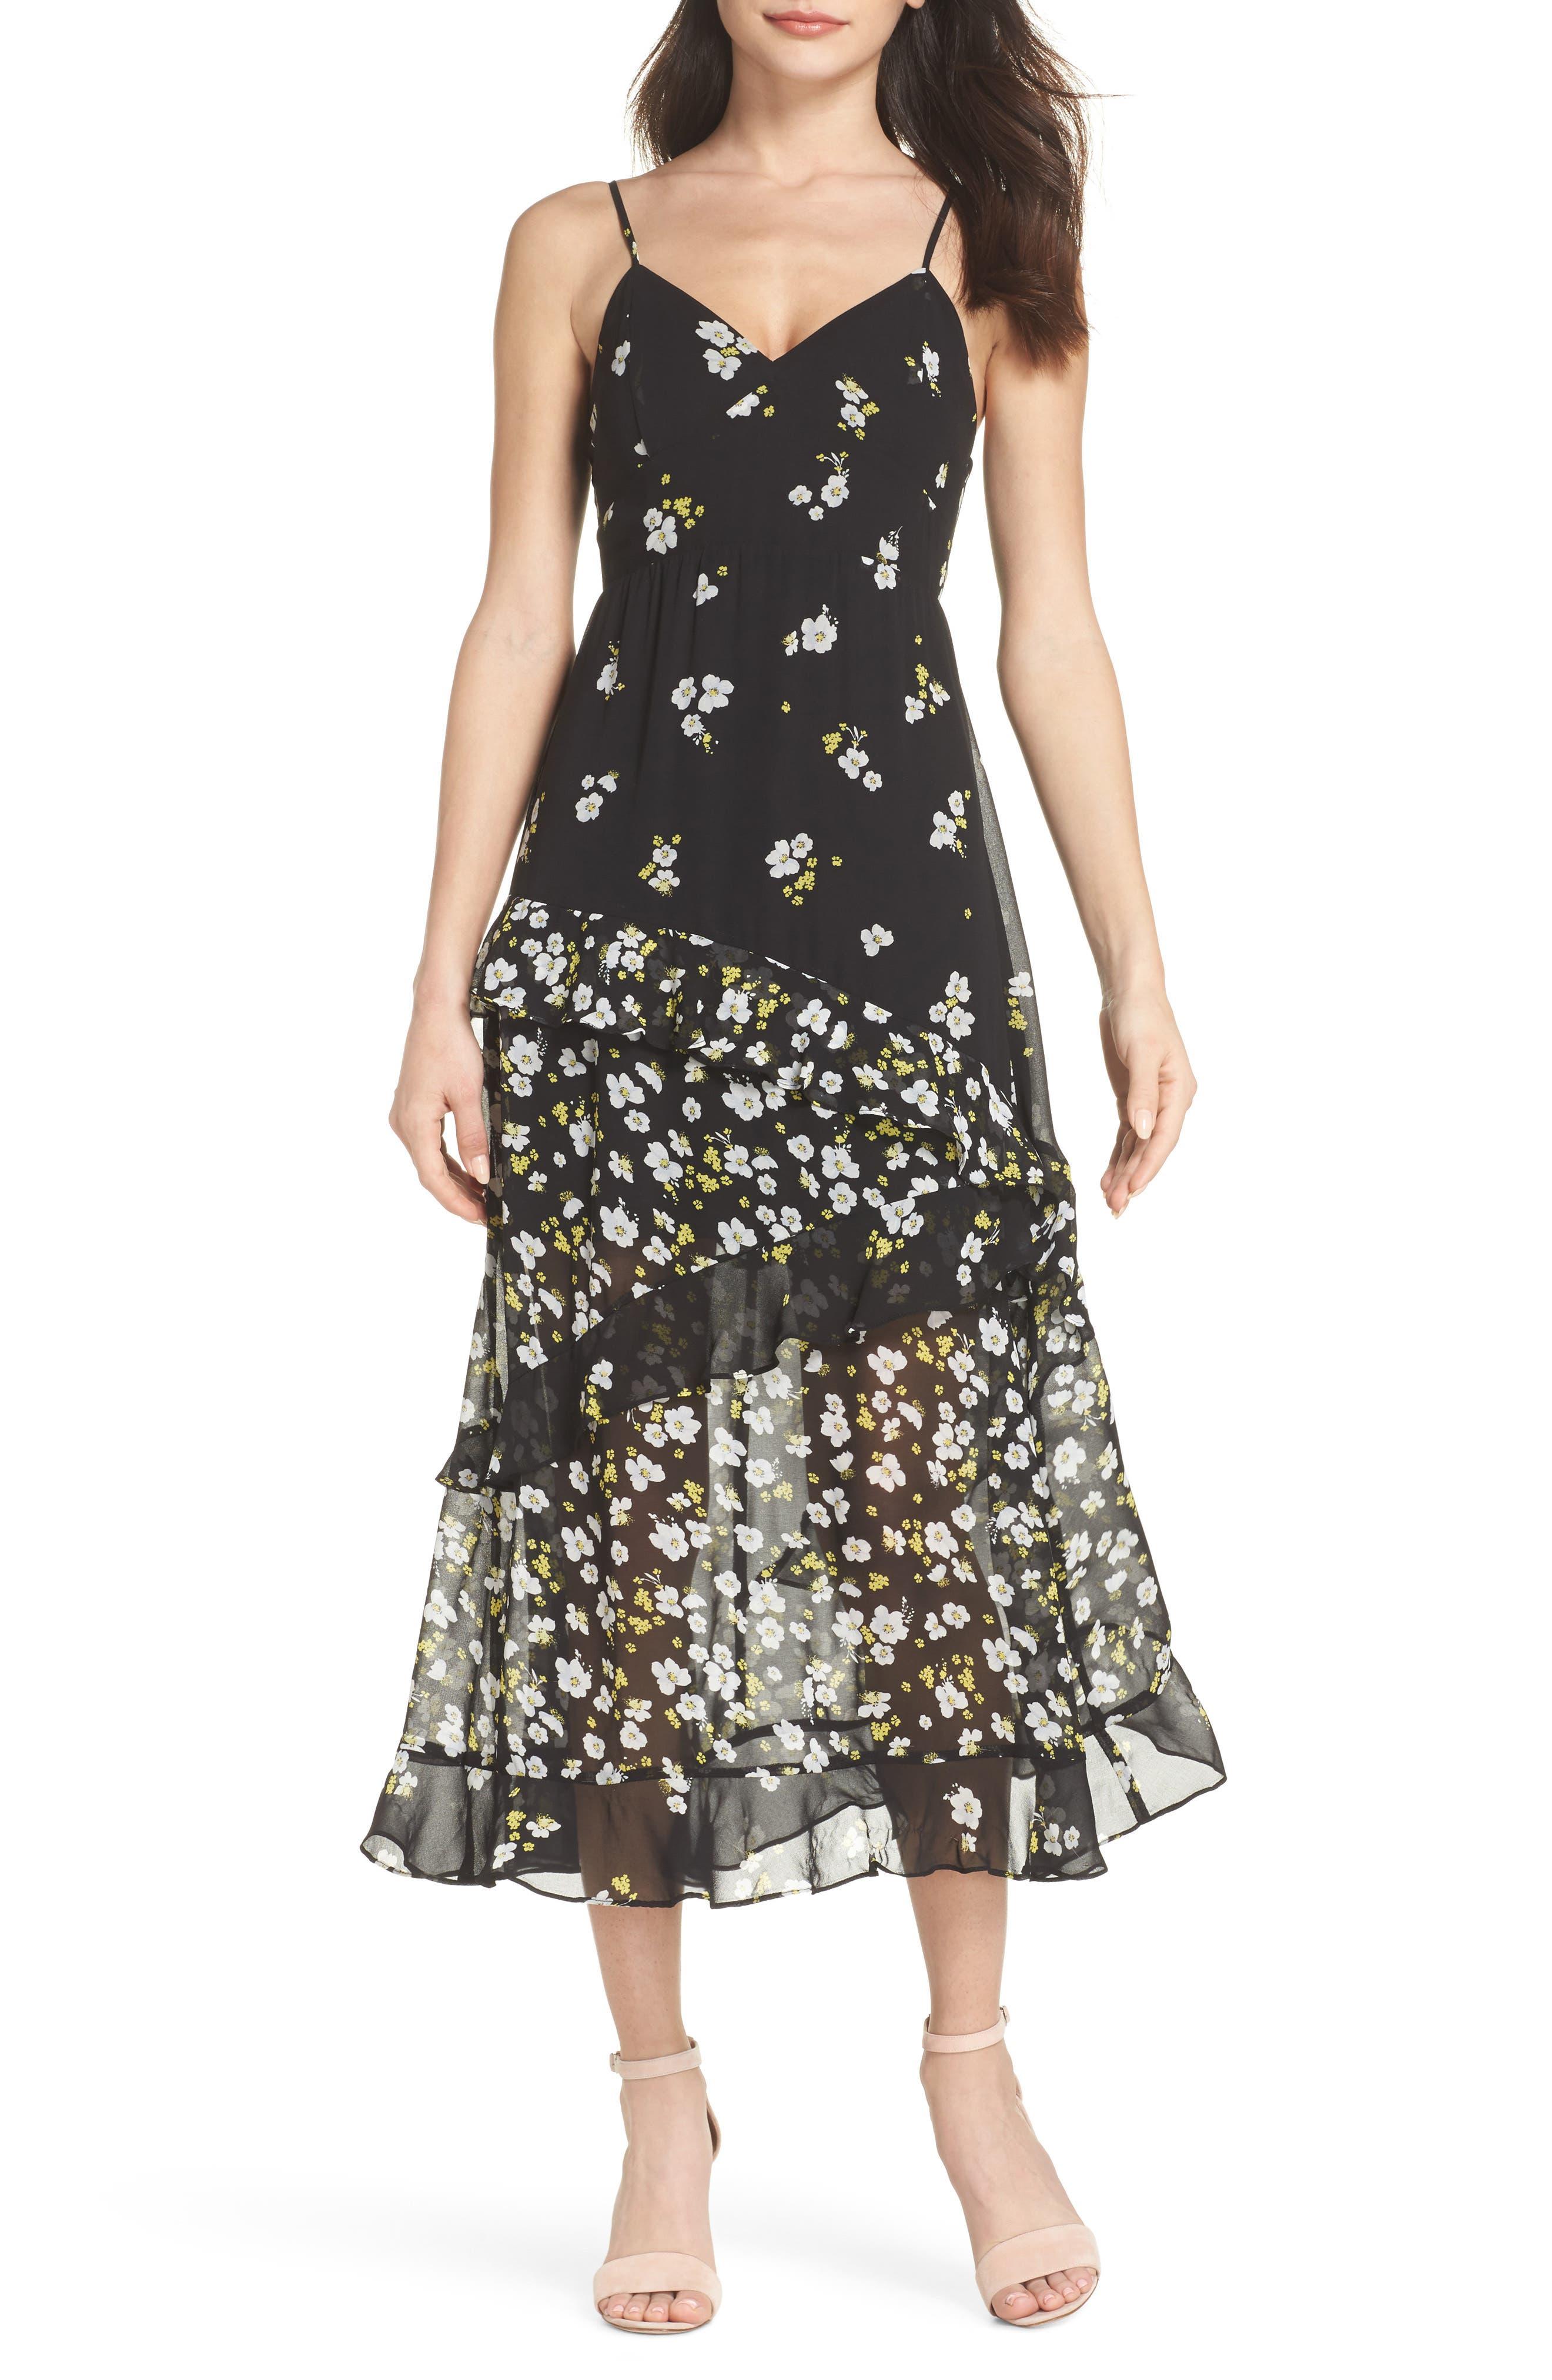 Ditzy Floral & Ruffle Chiffon Dress,                         Main,                         color, 001